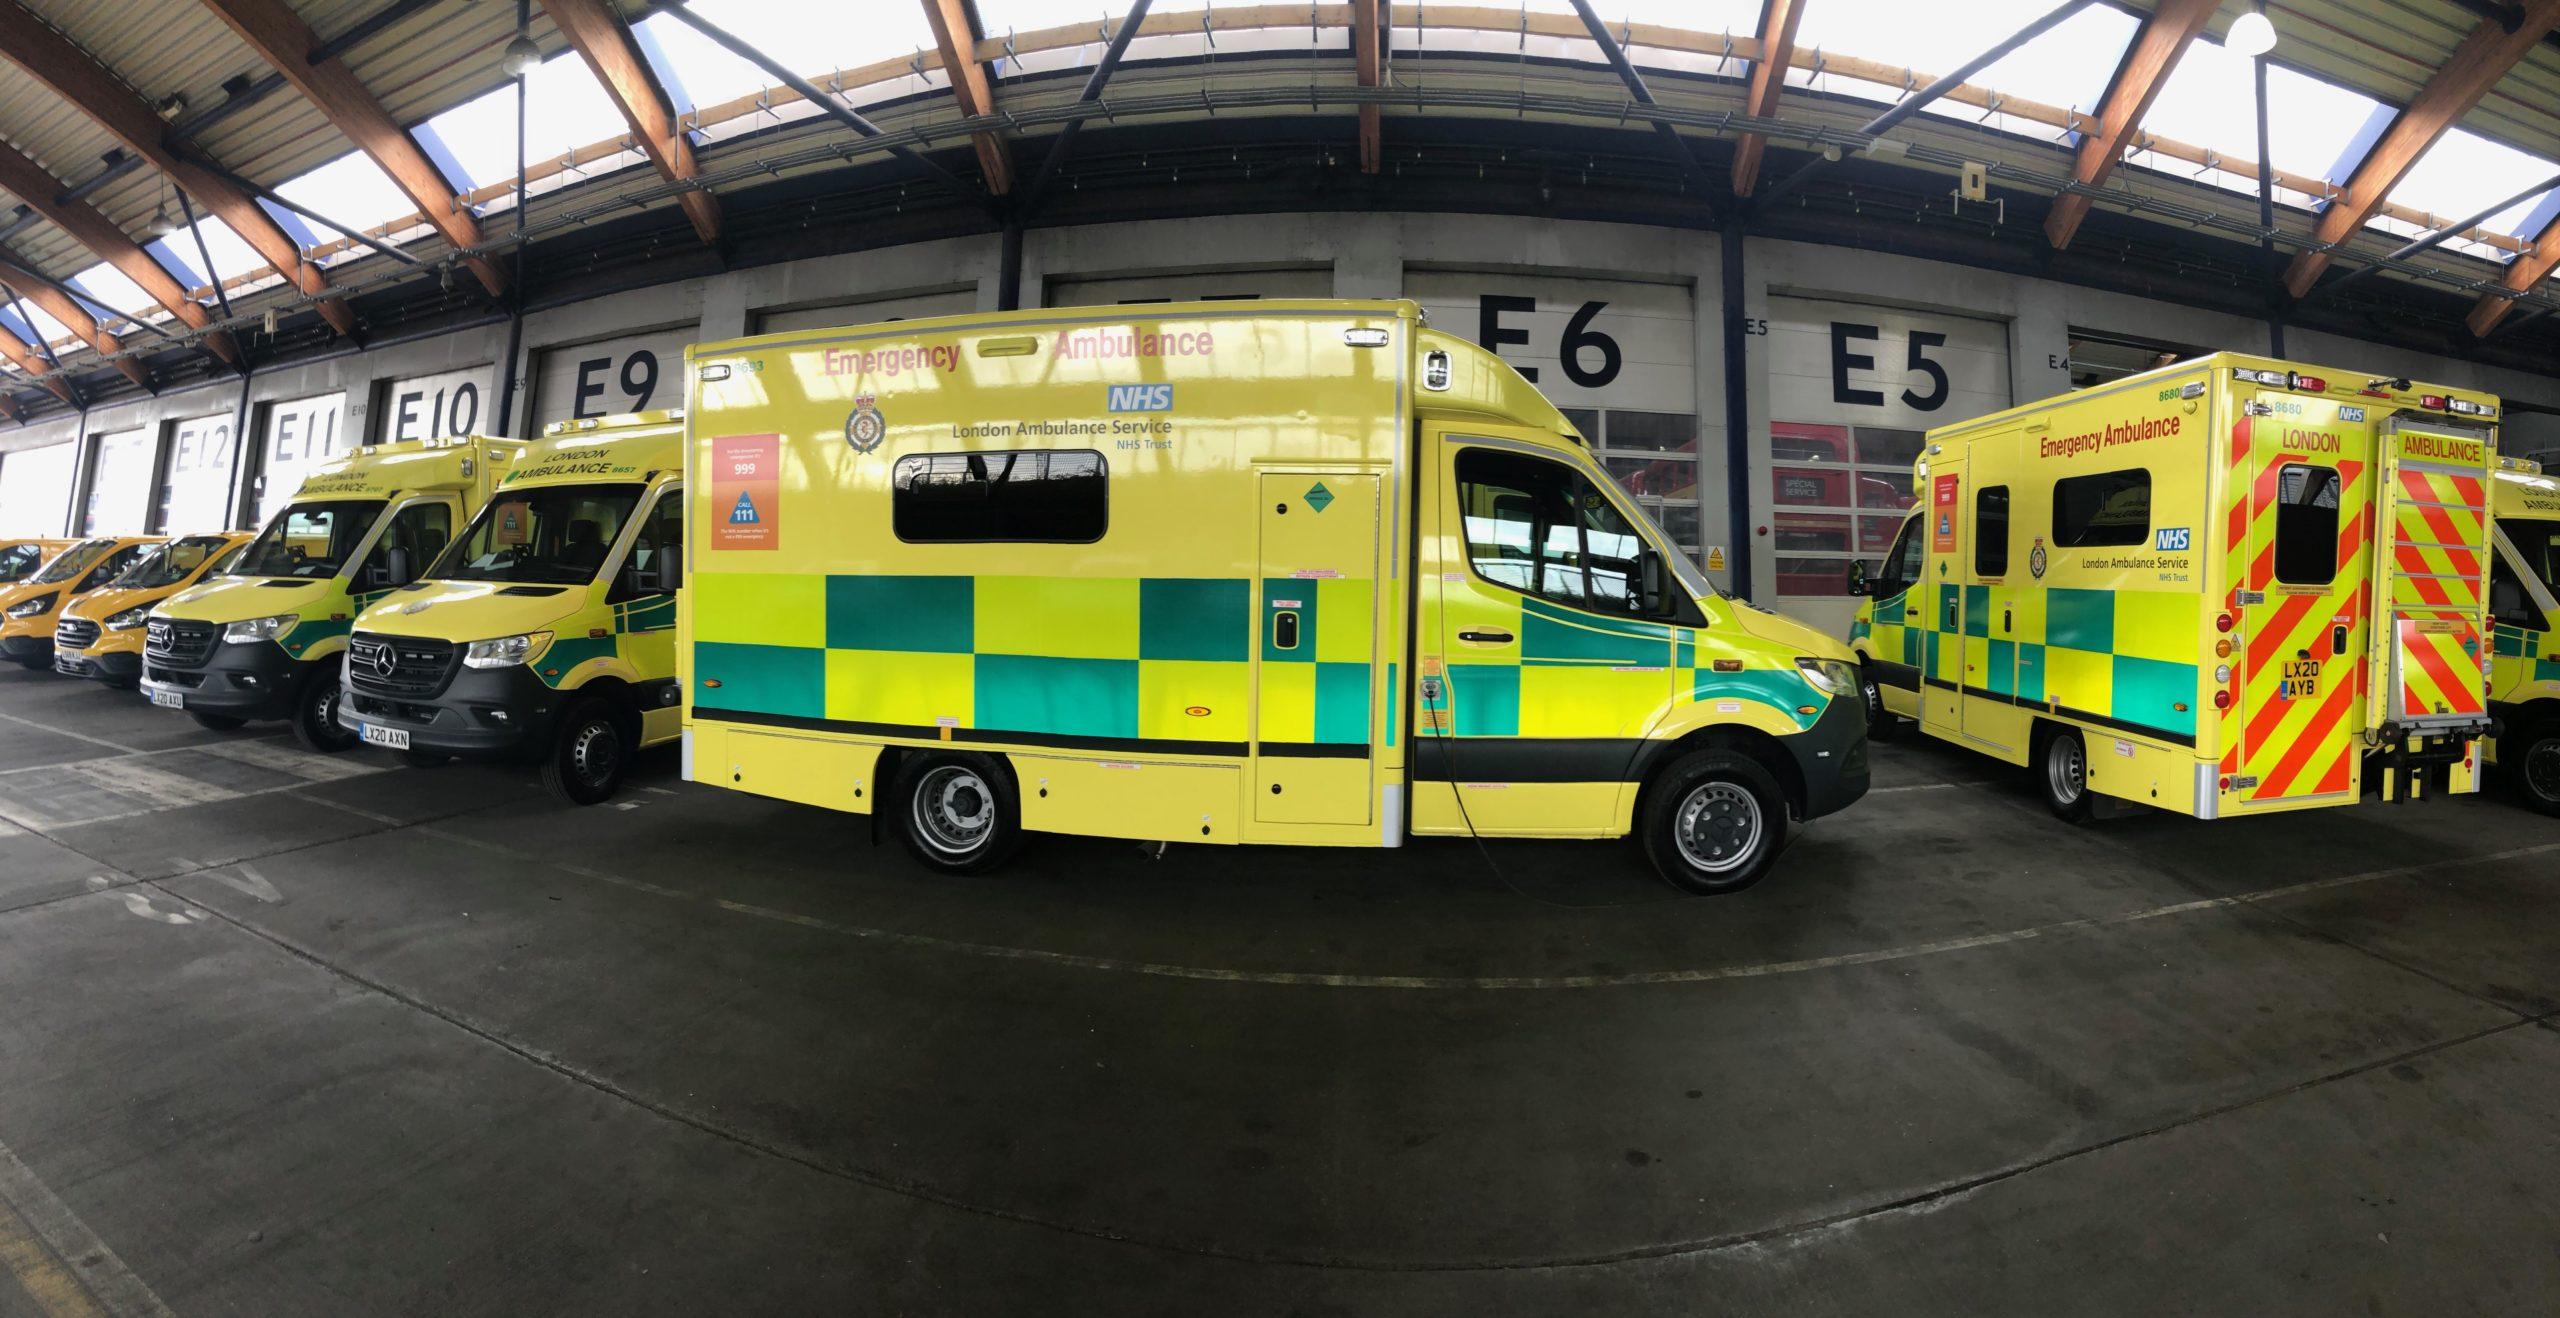 row of new ambulances in garage